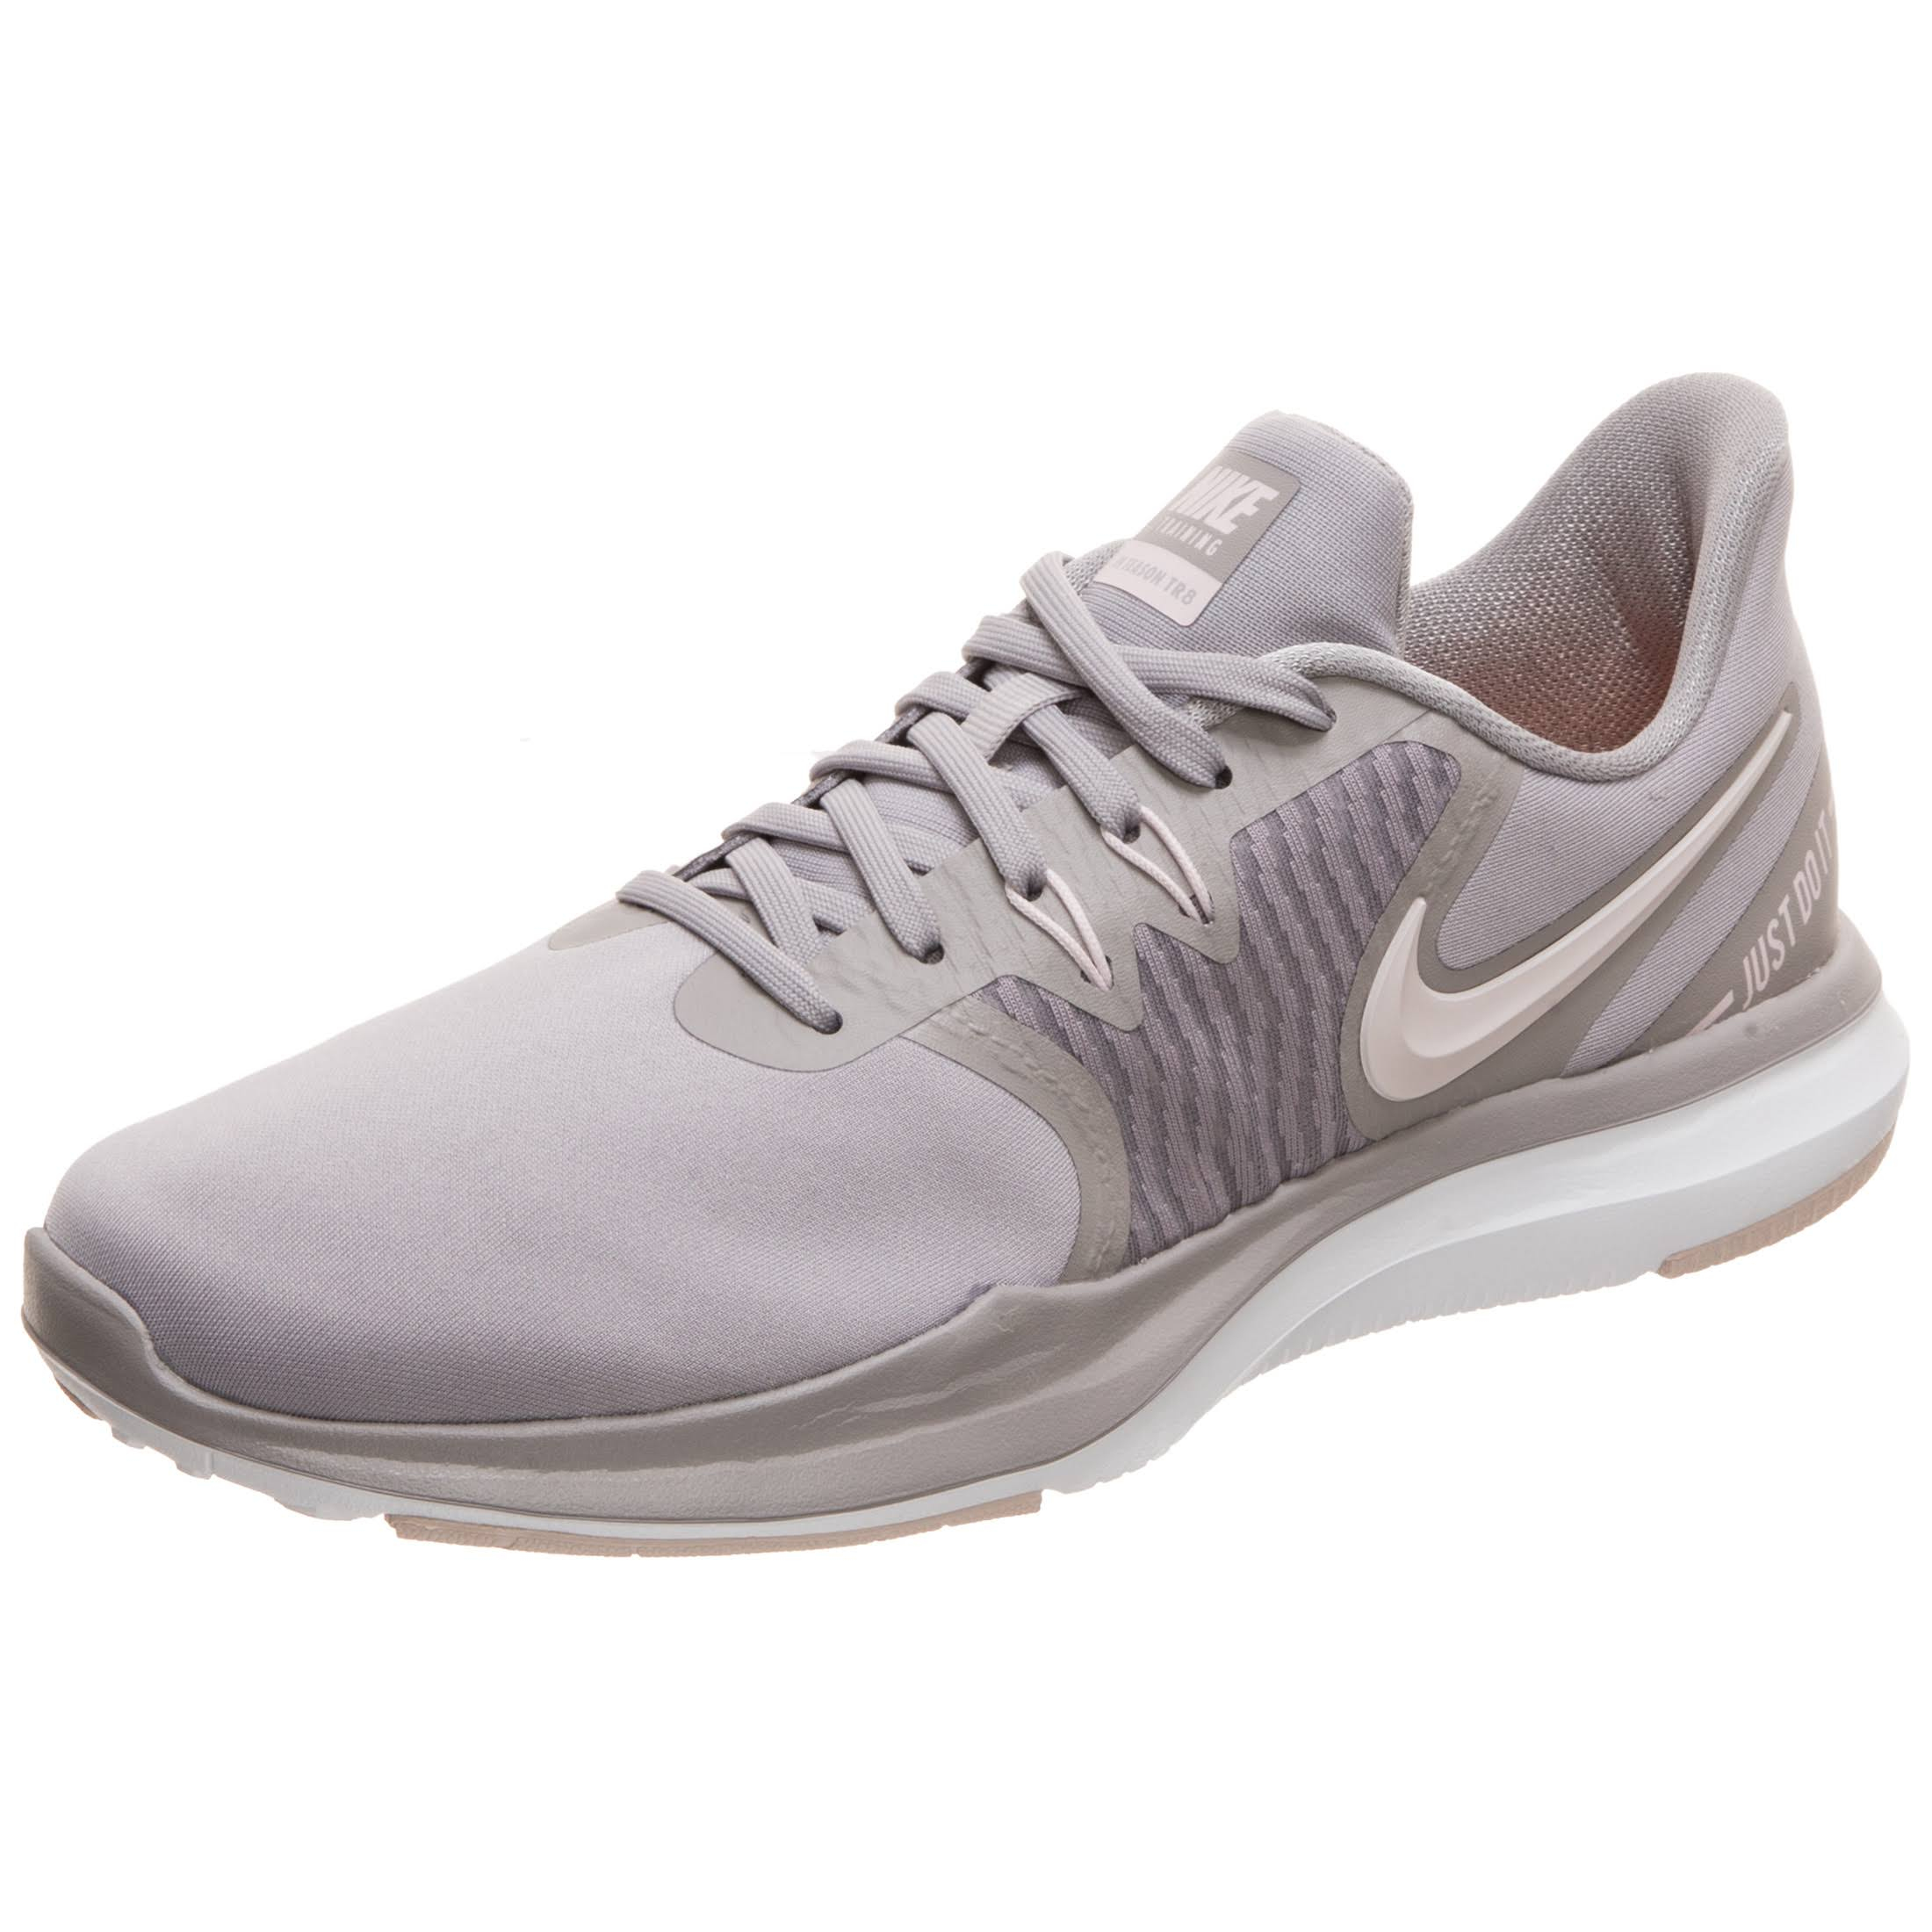 In season 8 Grau Nike Tr Fitnessschuhe 42 Damen Gr Grau qOTOntEz